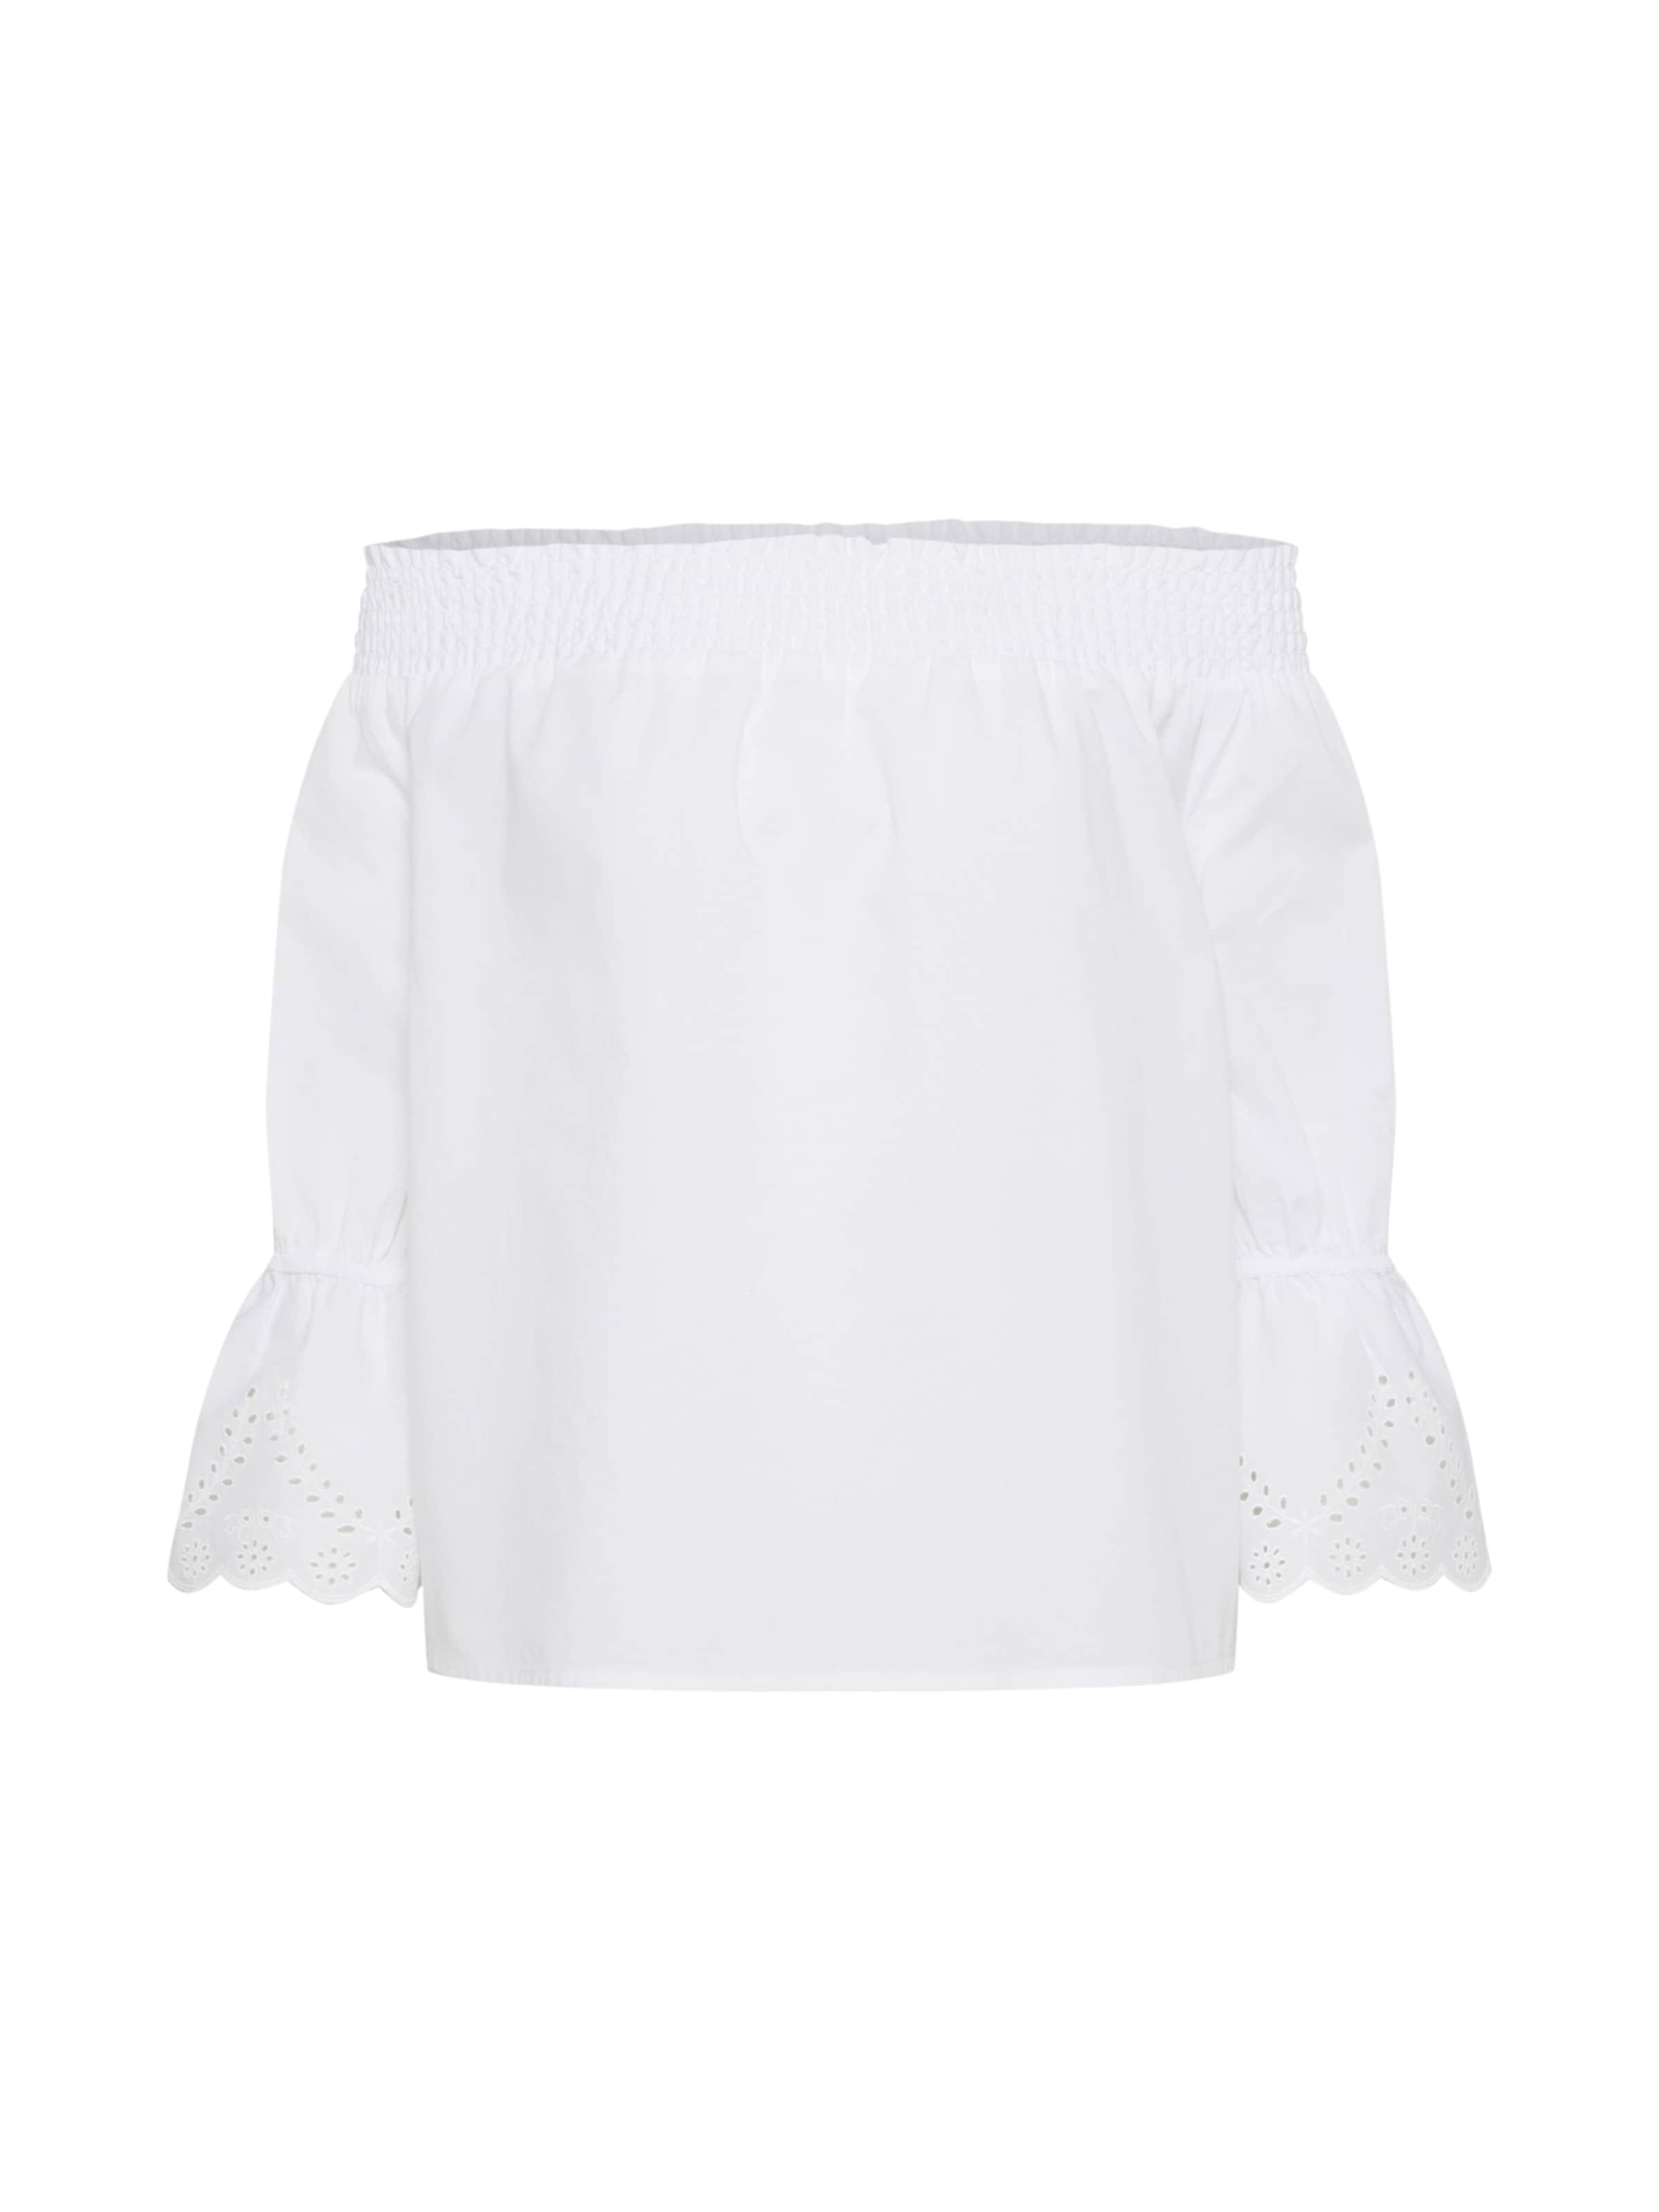 Bluse Tom In Tailor Weiß Denim HW2ID9E